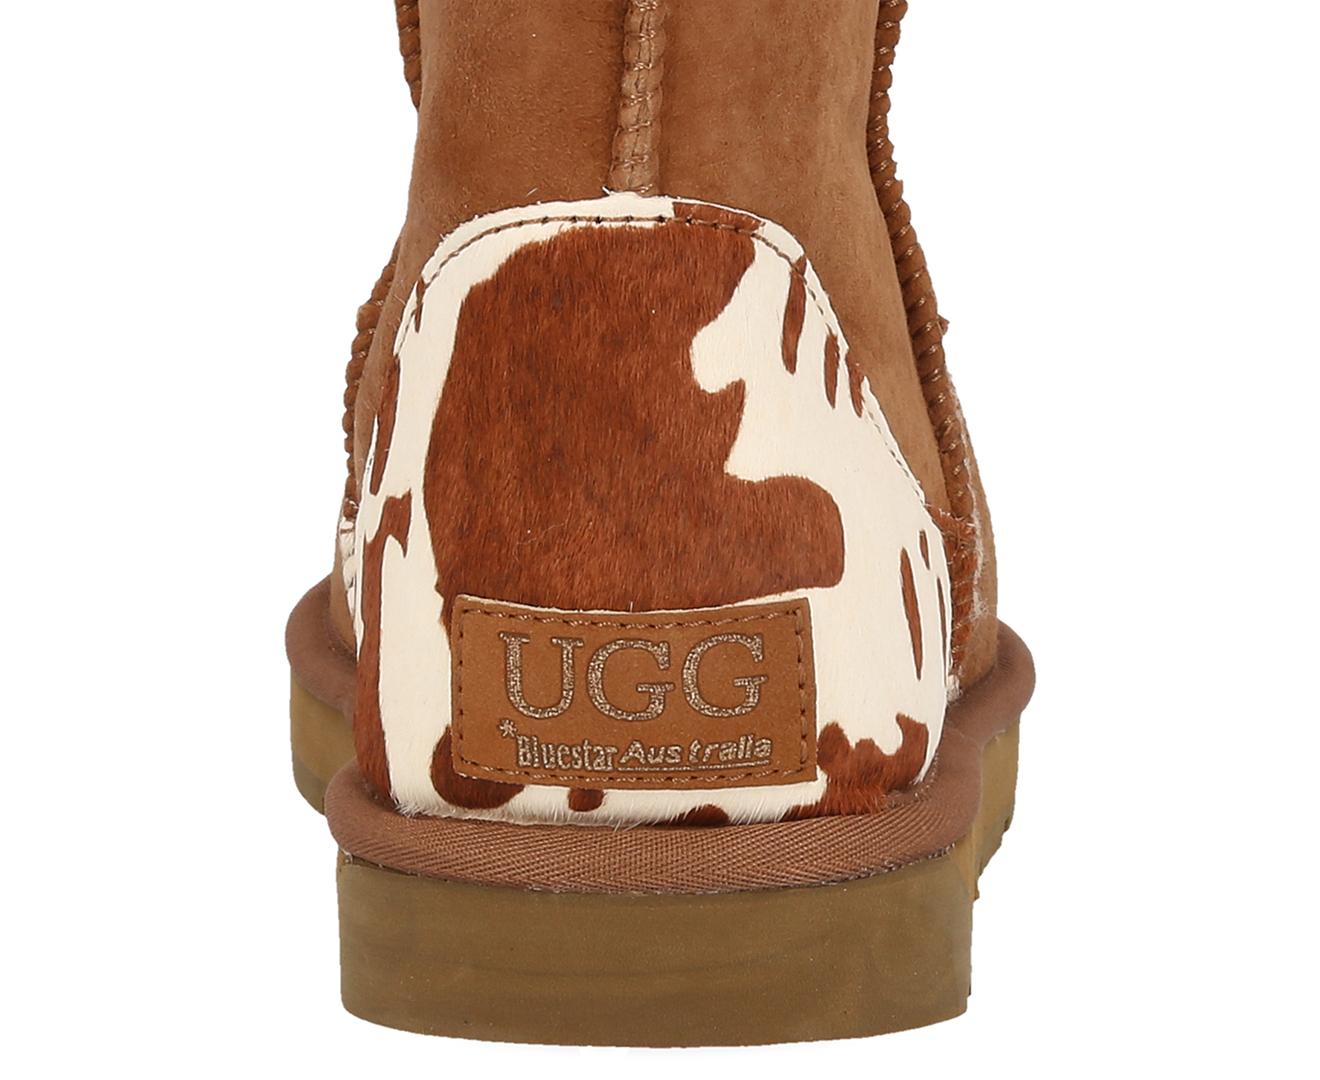 Bluestar Premium Australian Sheepskin 3/4 Ugg Boot - Chestnut Cow